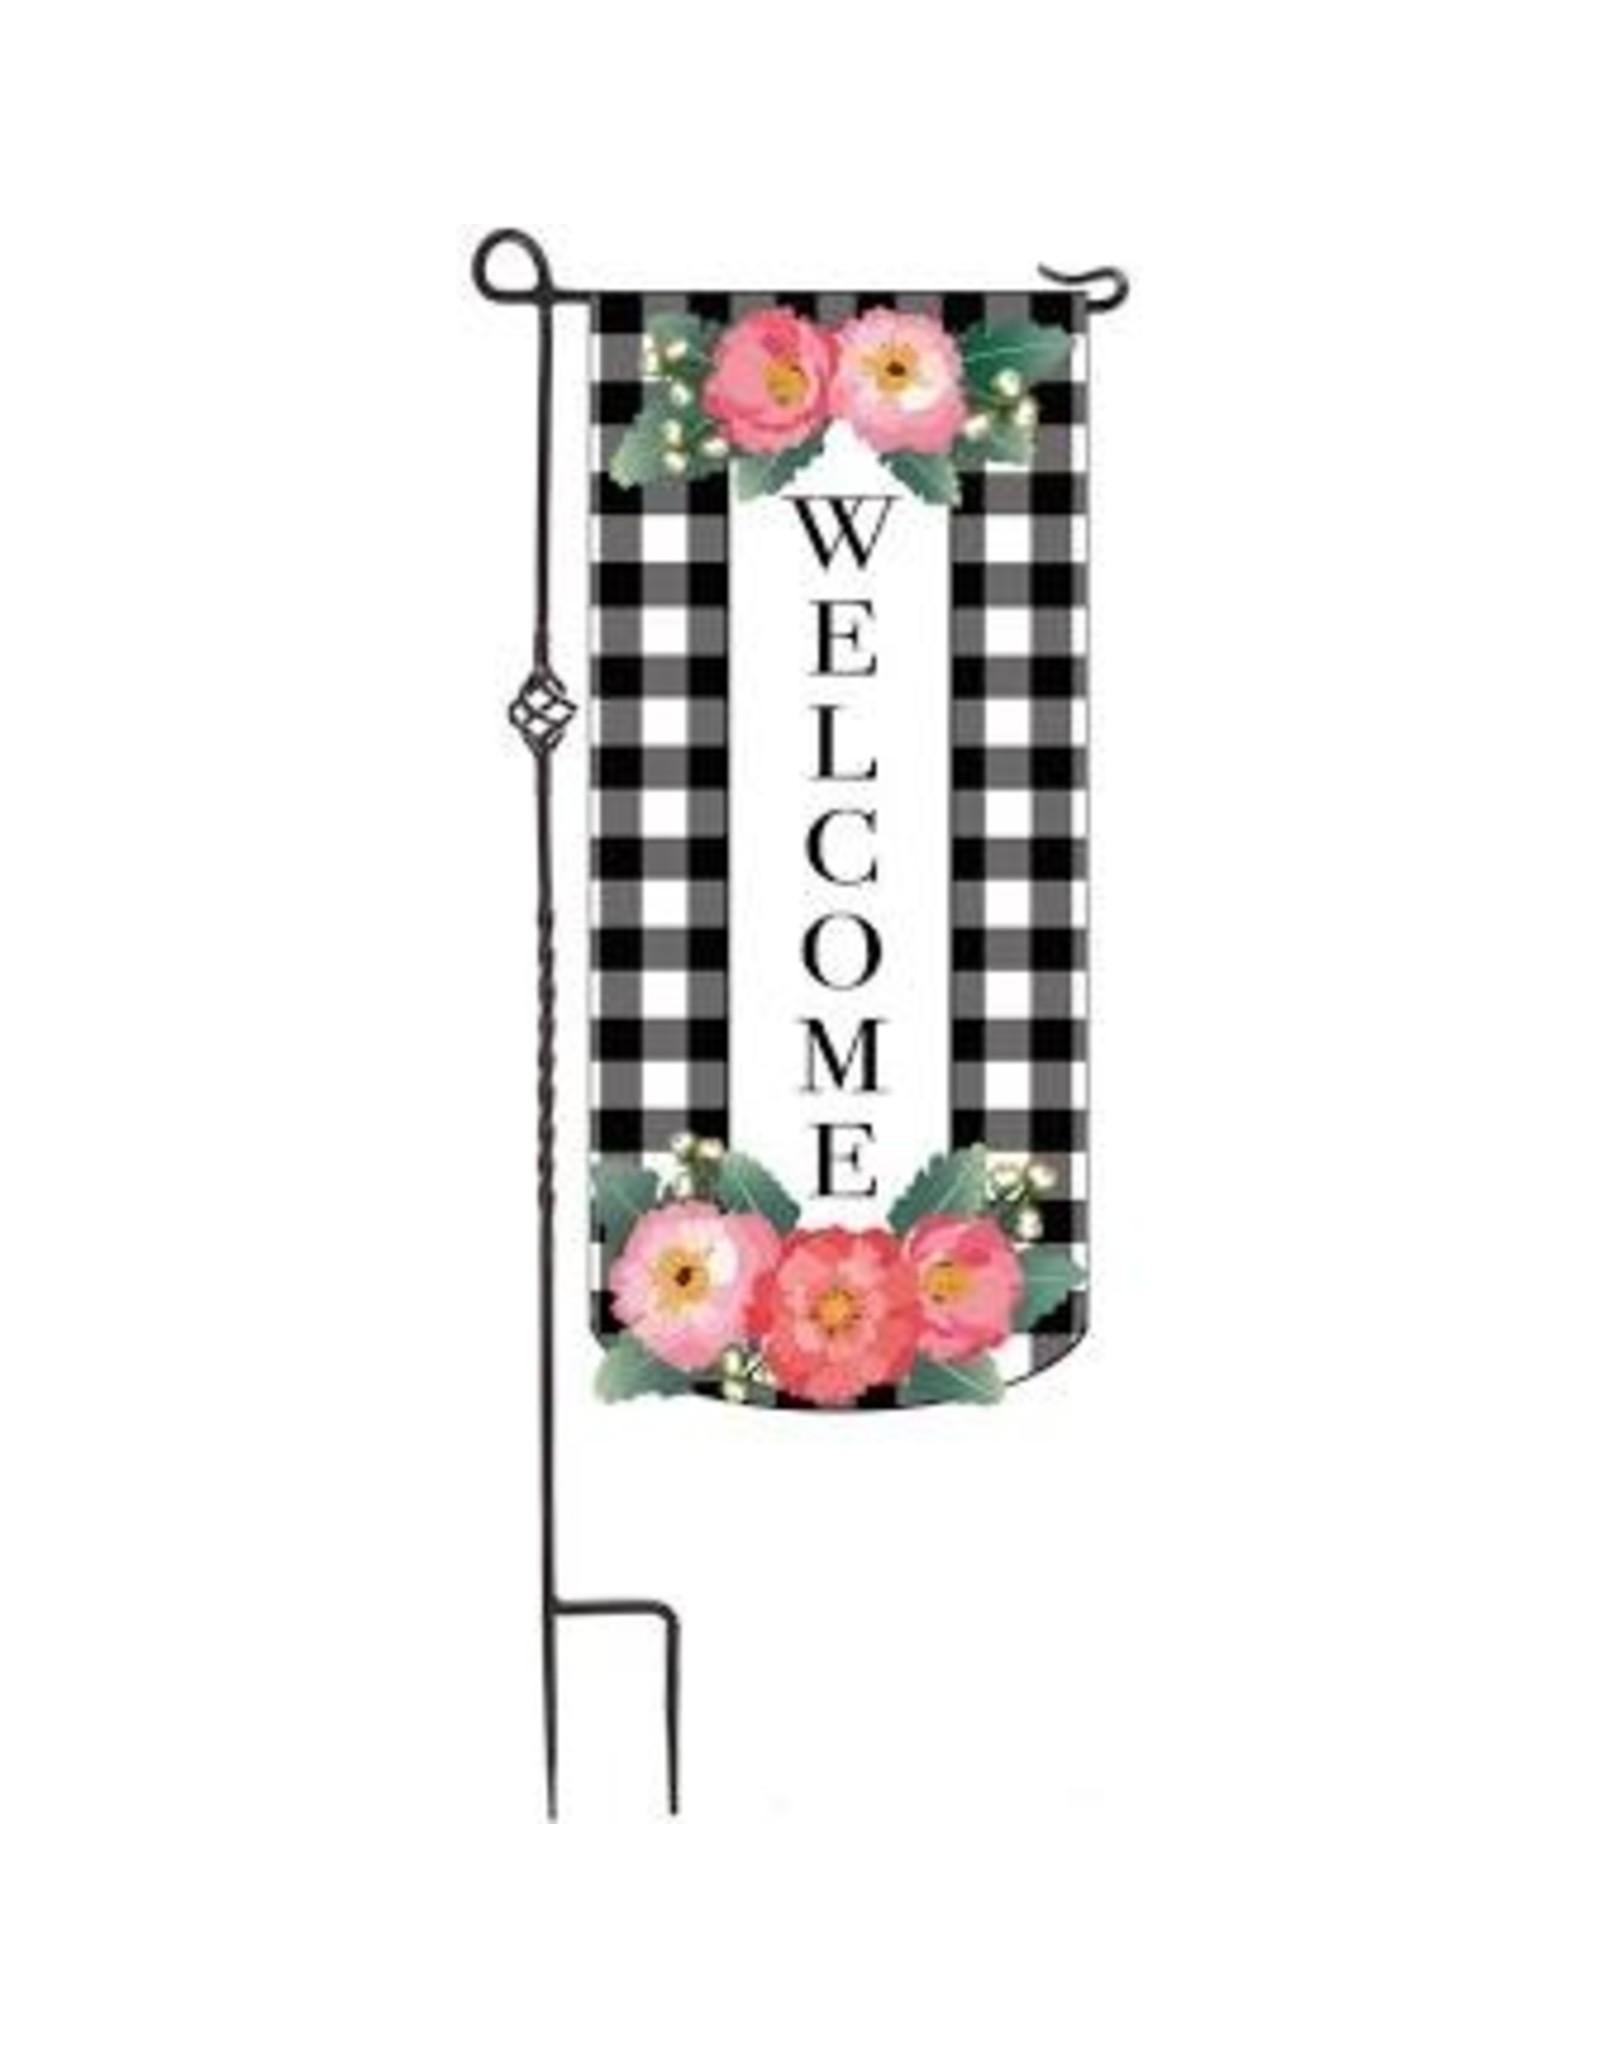 Evergreen Enterprises Spring Floral Welcome Everlasting Impressions Textile Décor